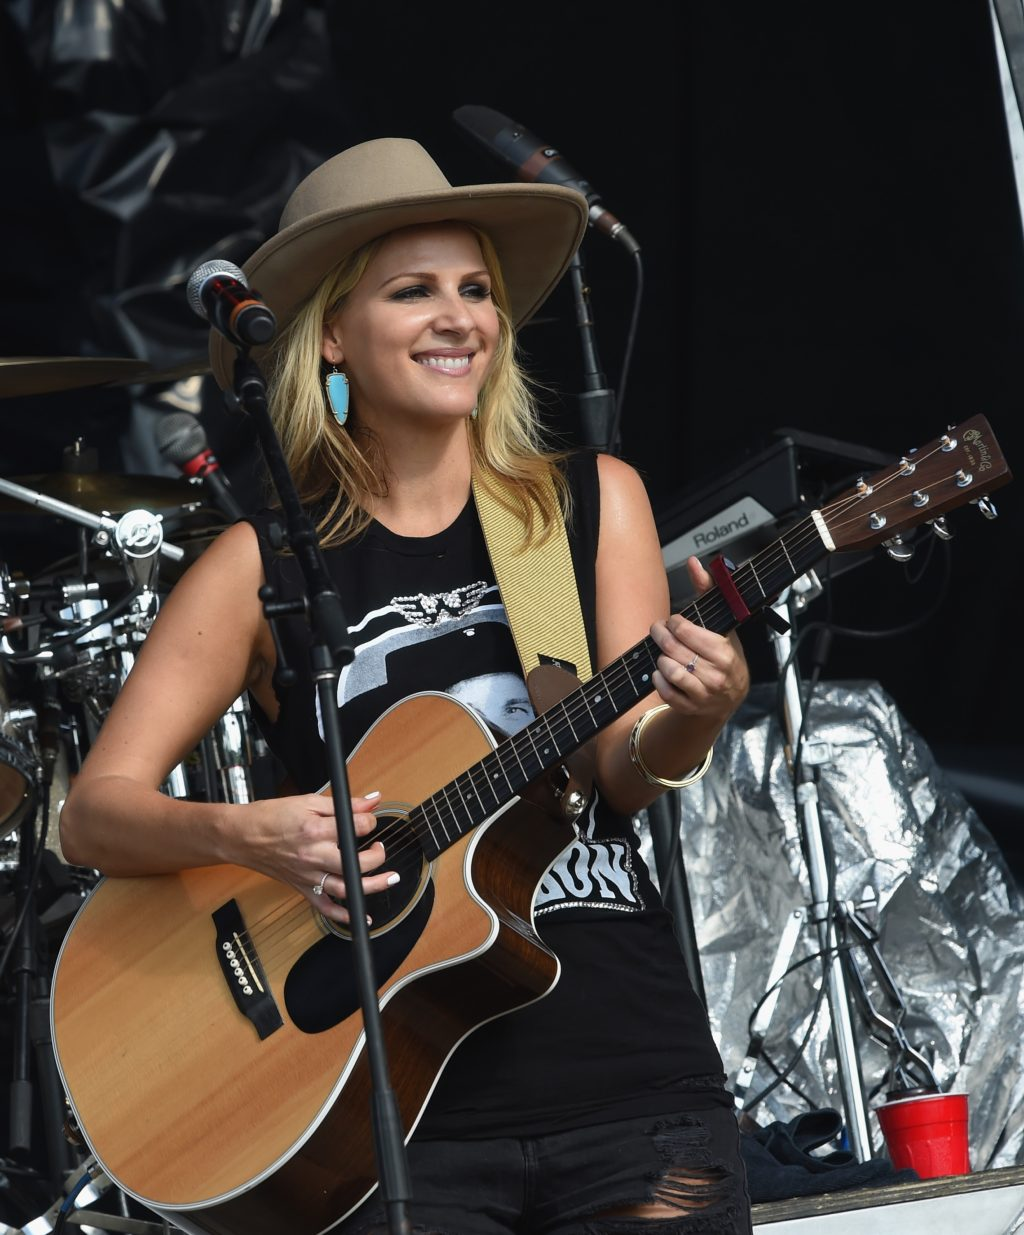 Jennifer Wayne in cowboy hat with guitar